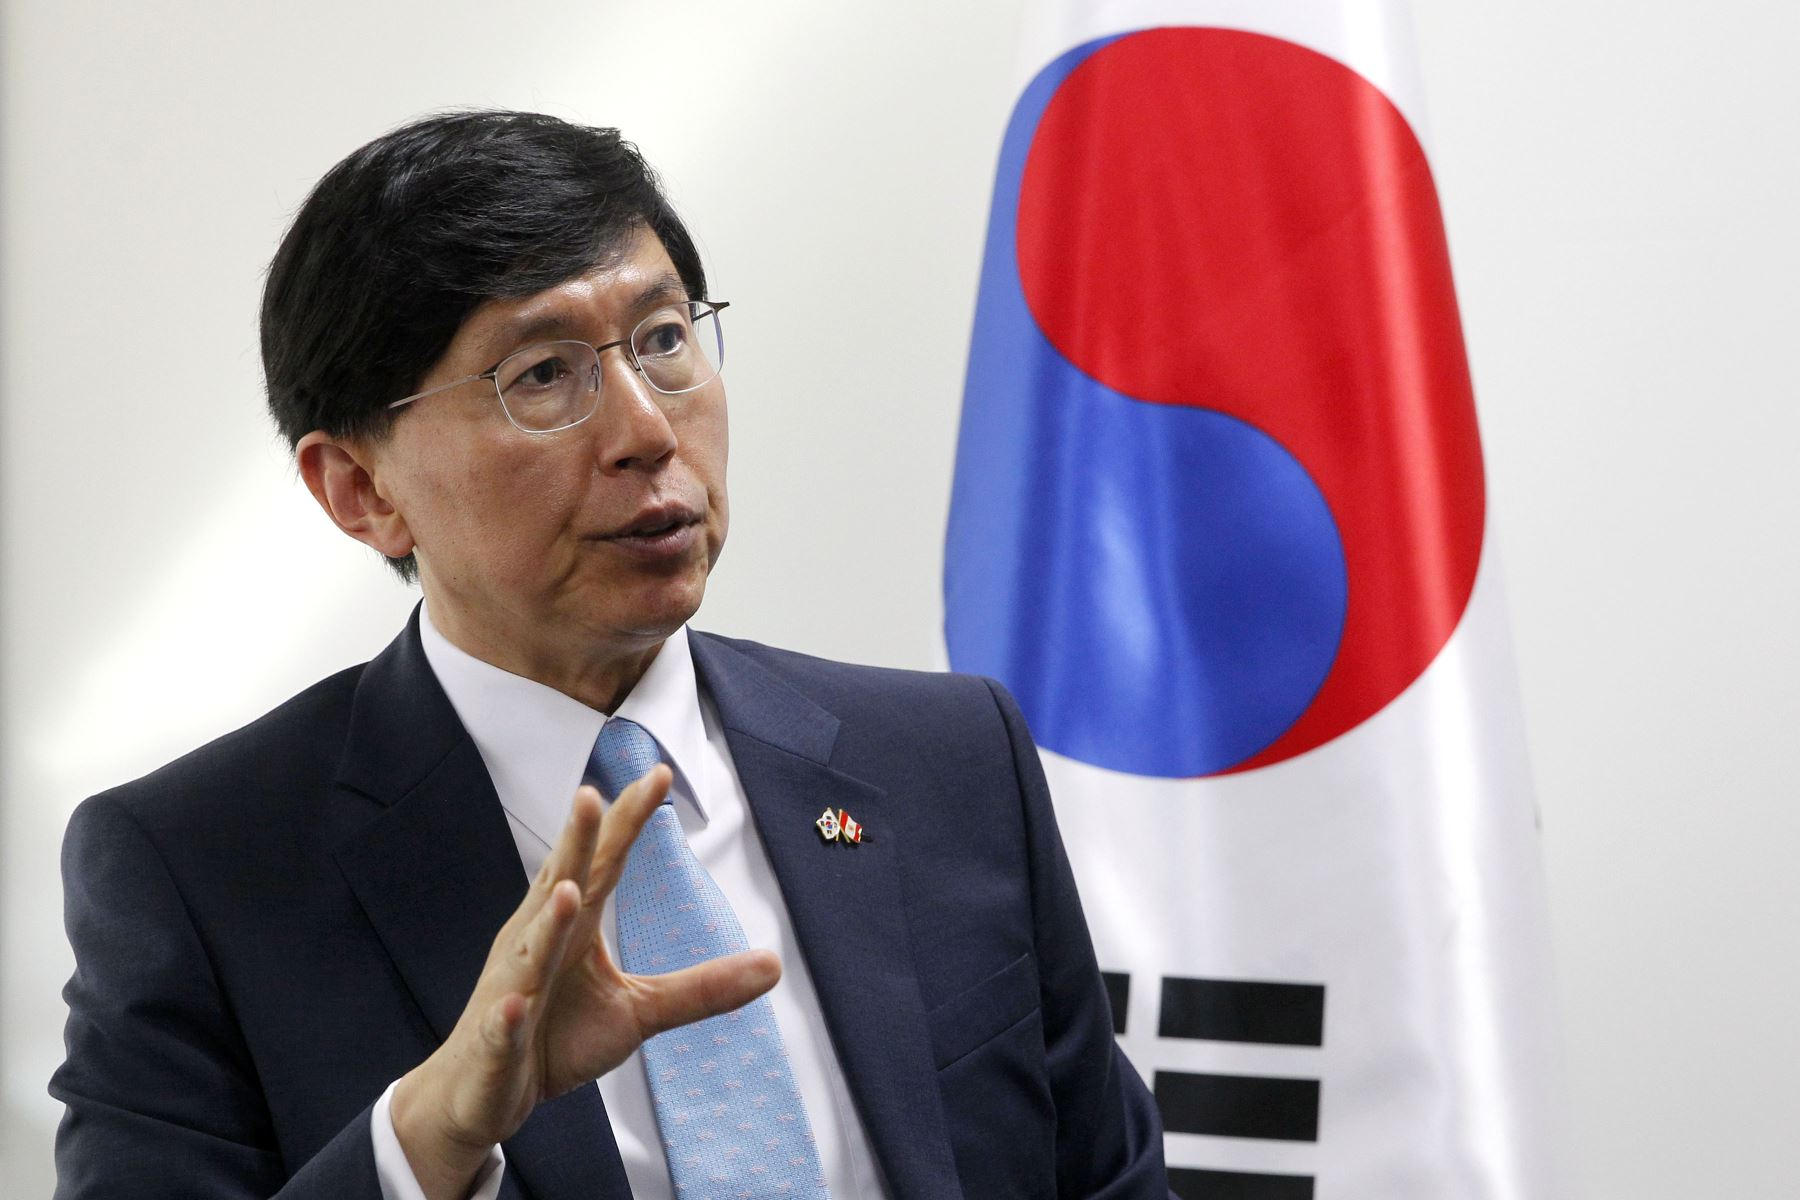 Embajador de Corea del Sur, June-hyuck Cho.Foto:  ANDINA/Dante Zegarra.